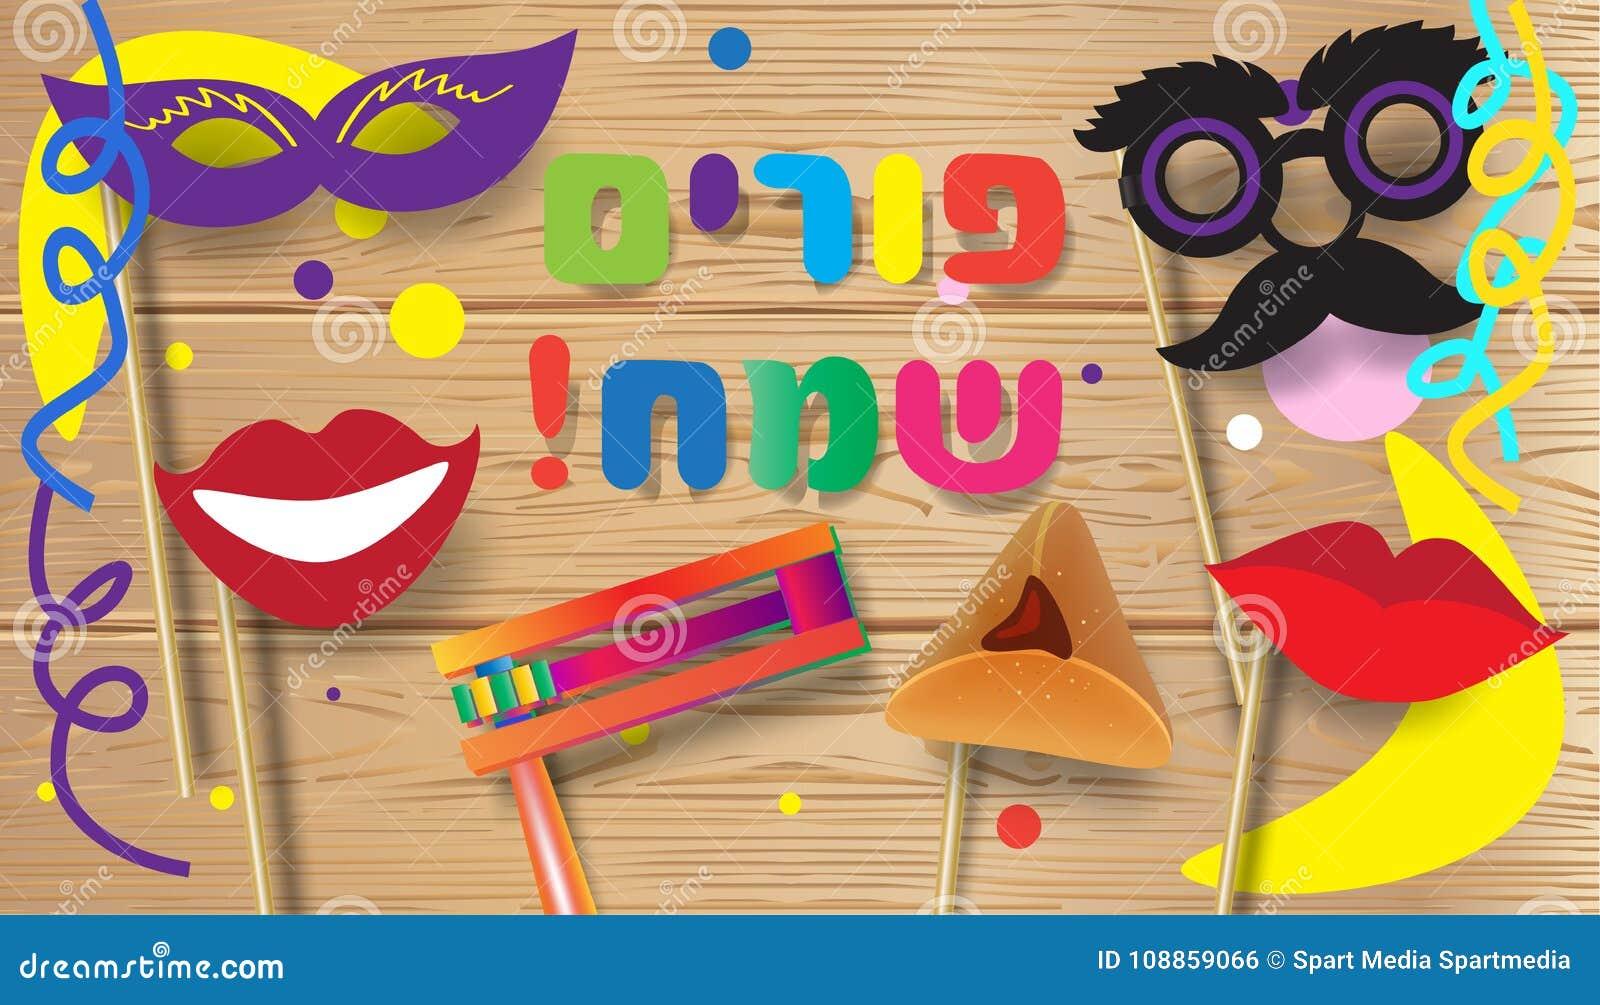 Purim festival greeting poster judaic design stock vector download purim festival greeting poster judaic design stock vector illustration of 2019 esther m4hsunfo